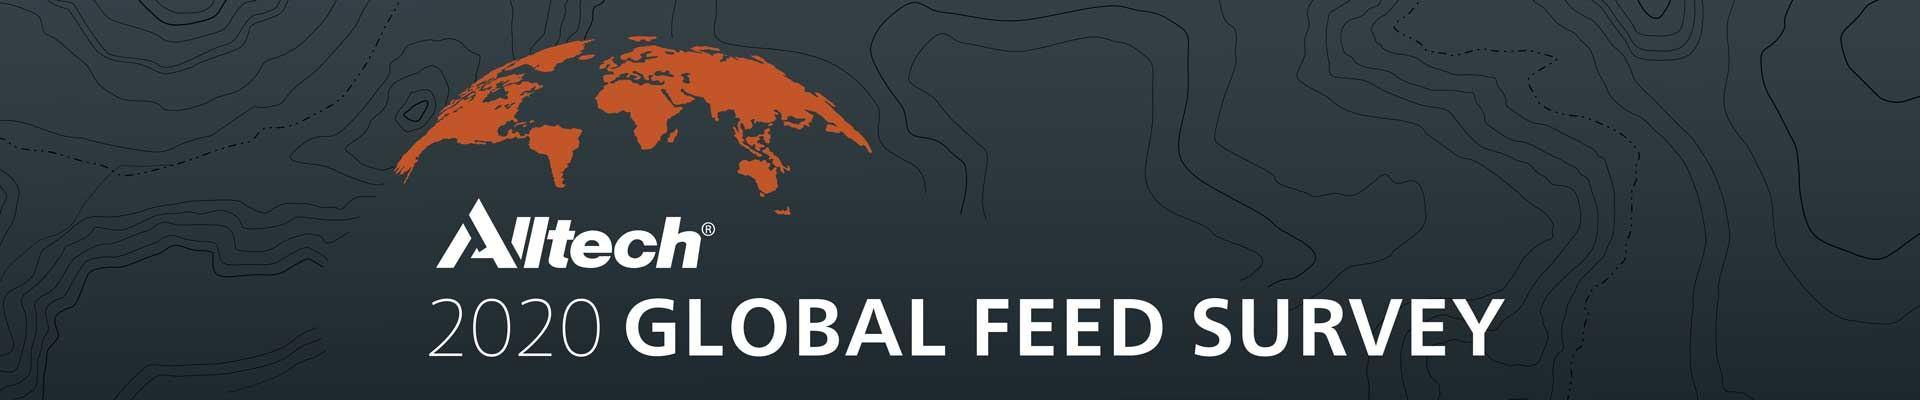 Alltech Global Feed Survey 2020 header image